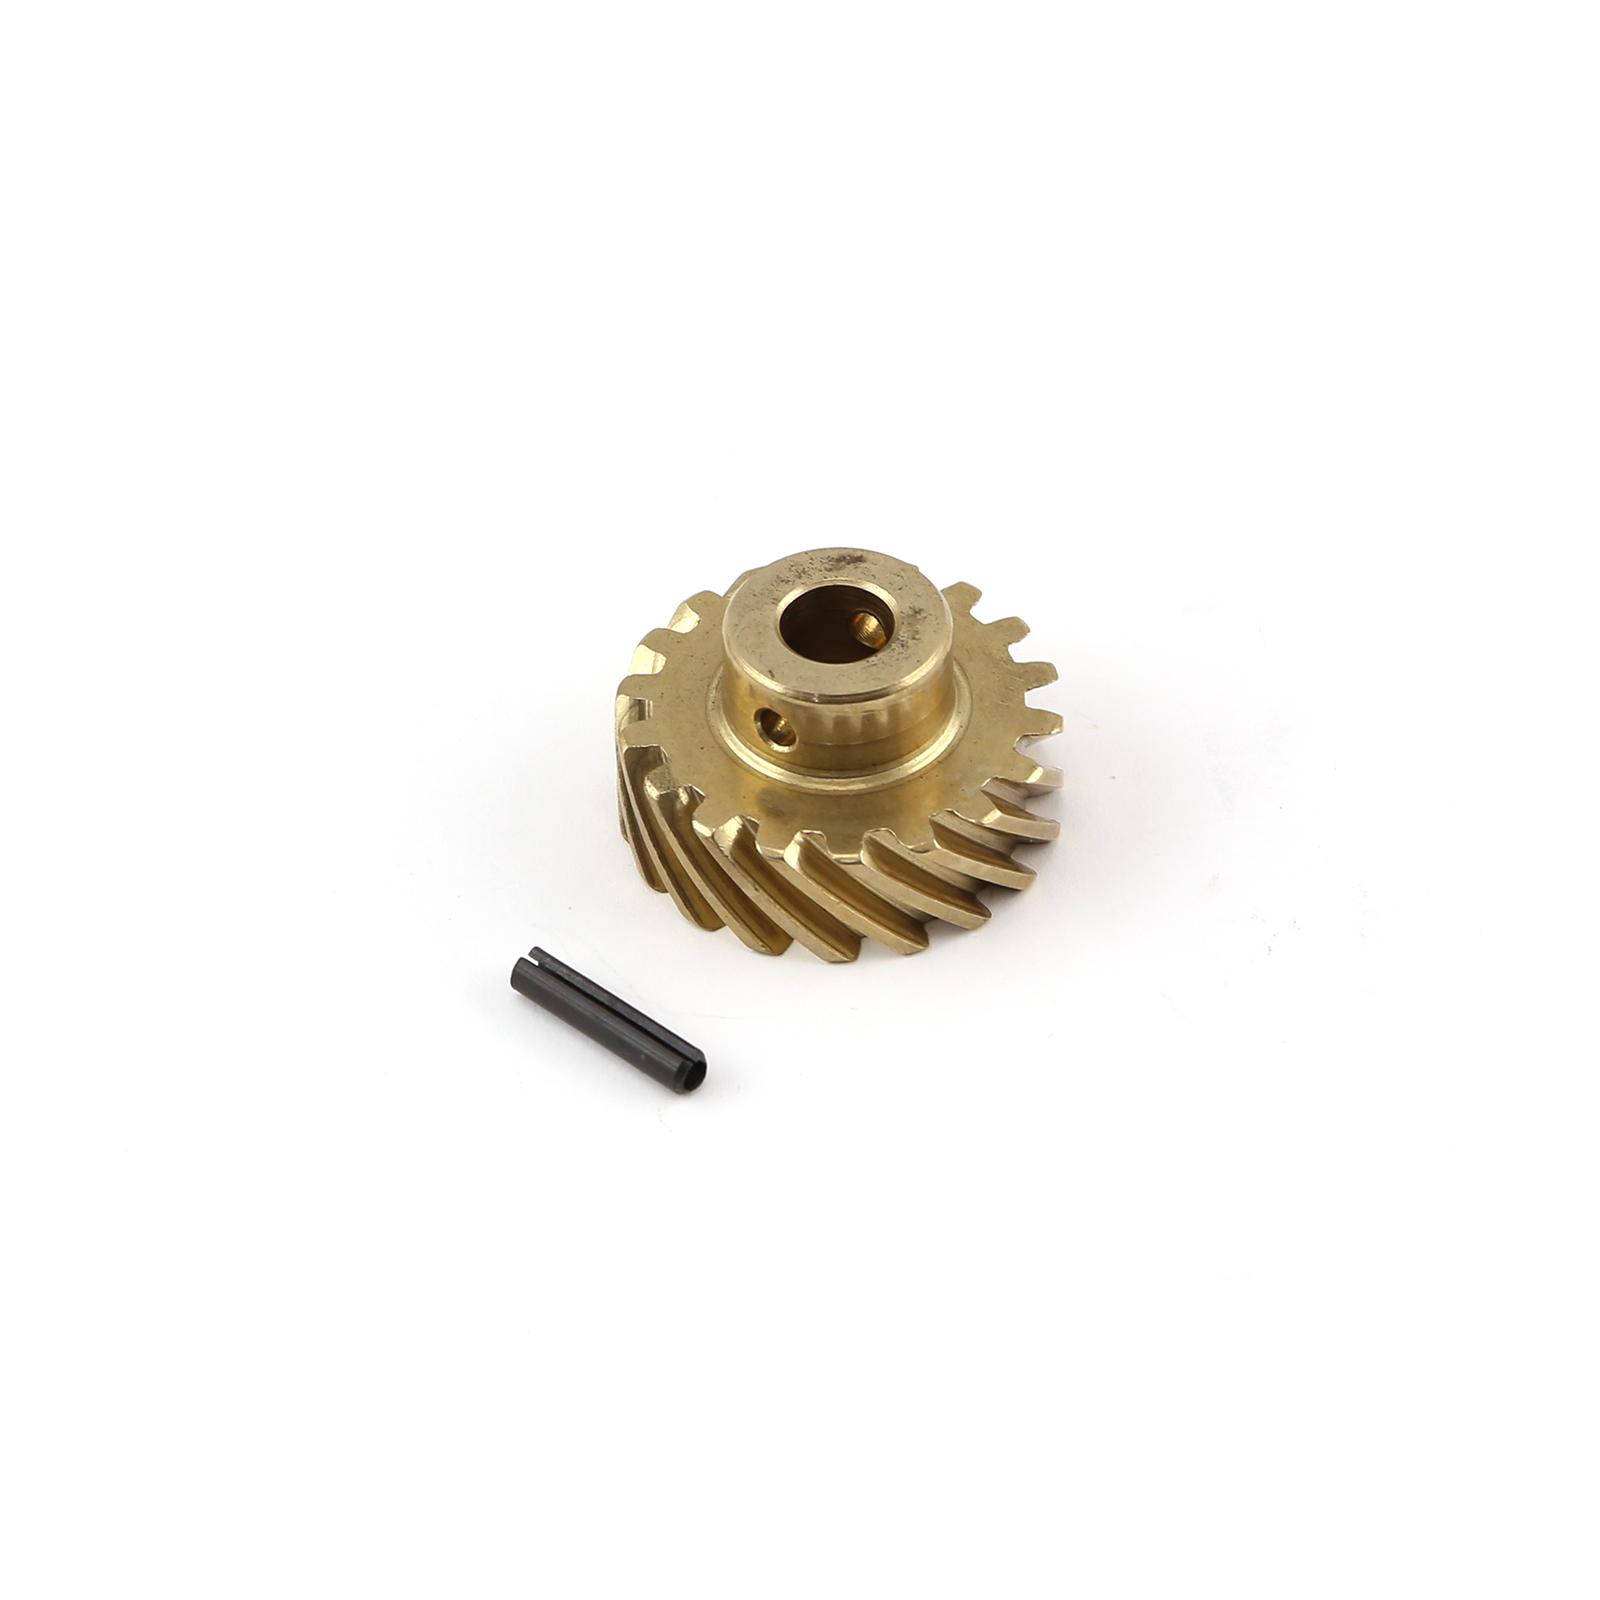 Mopar Chrysler SB 318 340 360 5.2 5.9 Bronze .484 Shaft Distributor Gear